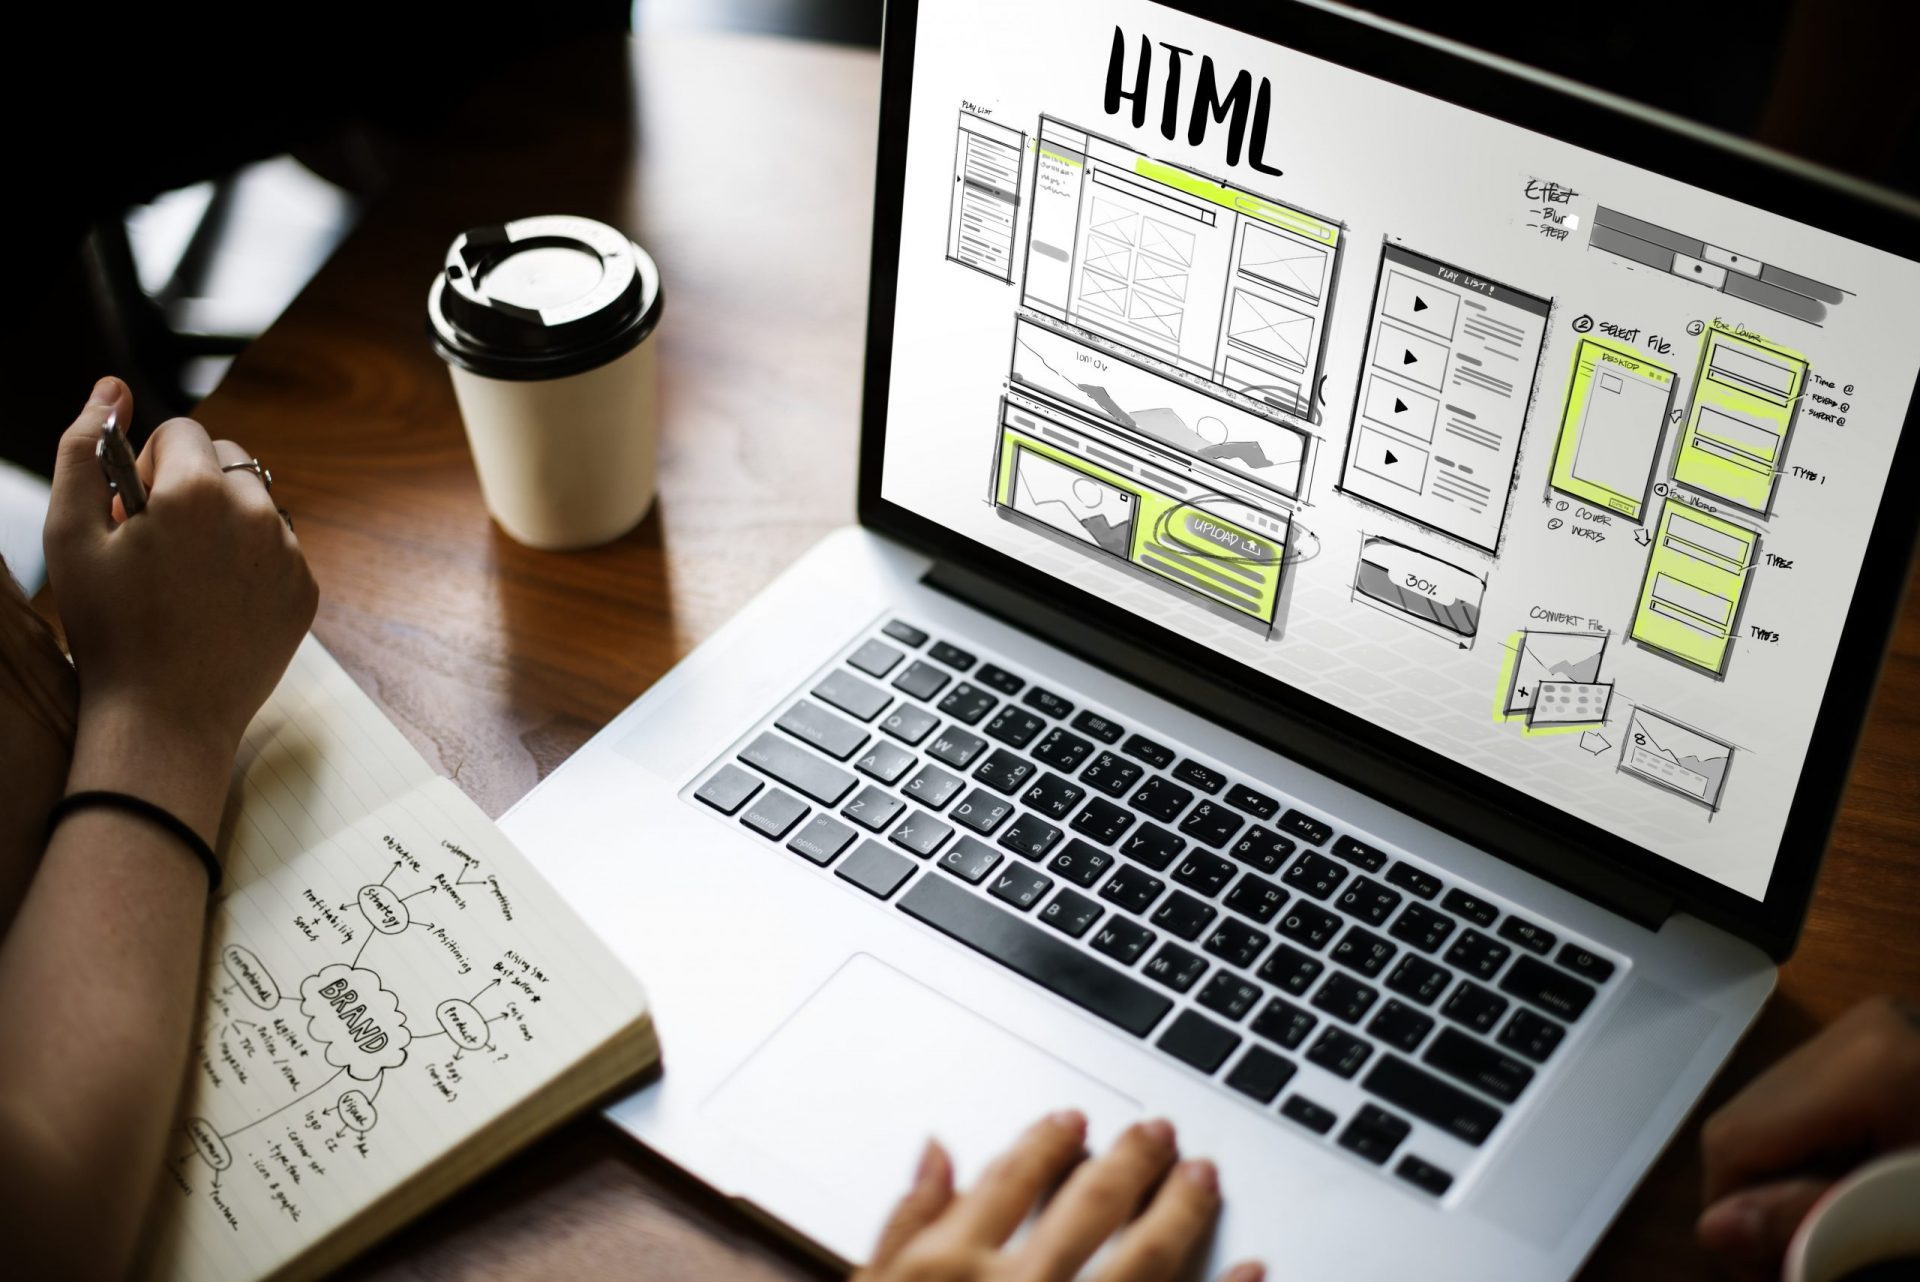 errors on websites